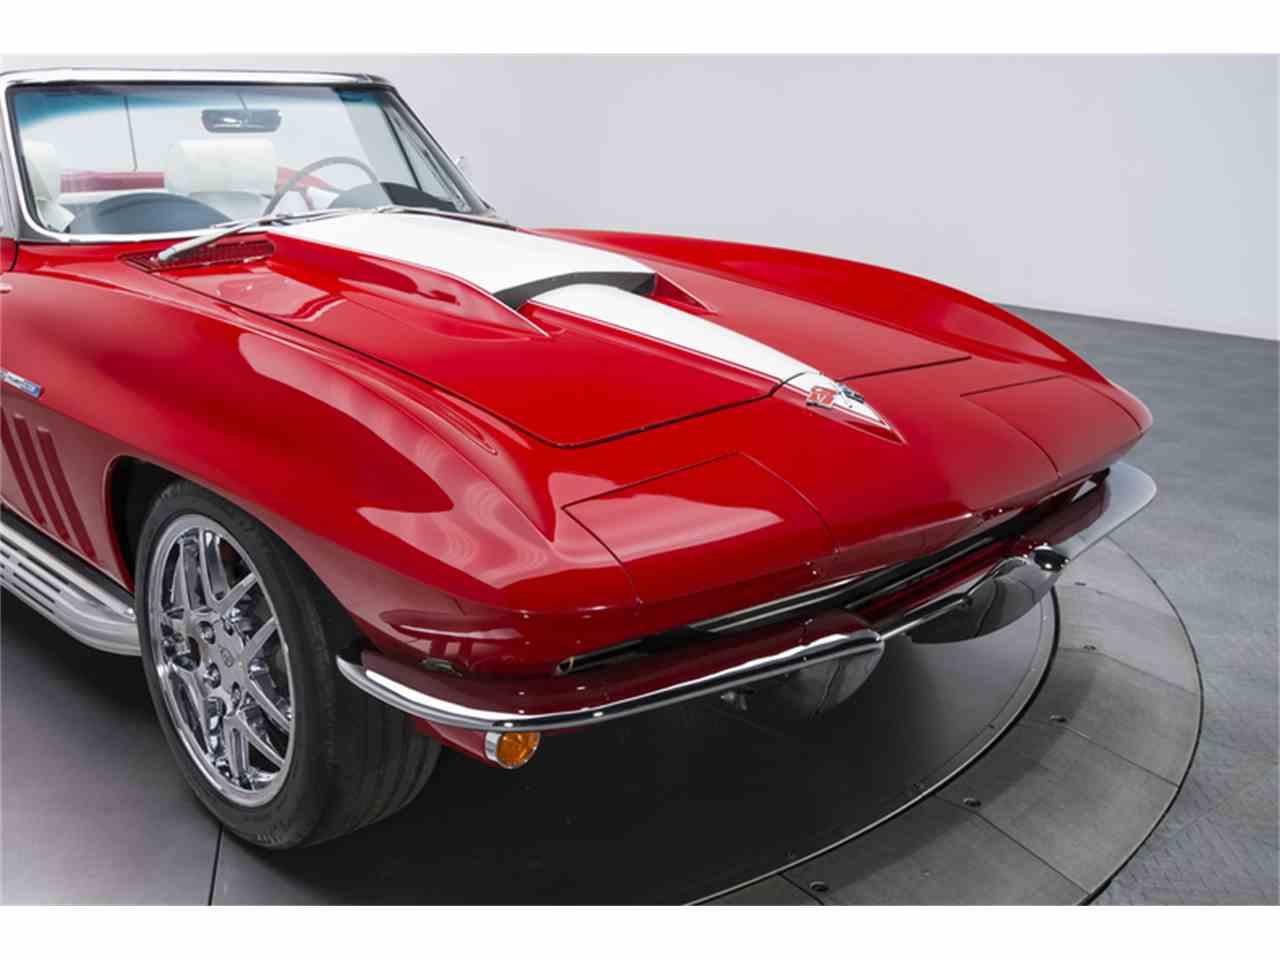 1965 chevrolet corvette stingray for sale cc 973138. Black Bedroom Furniture Sets. Home Design Ideas